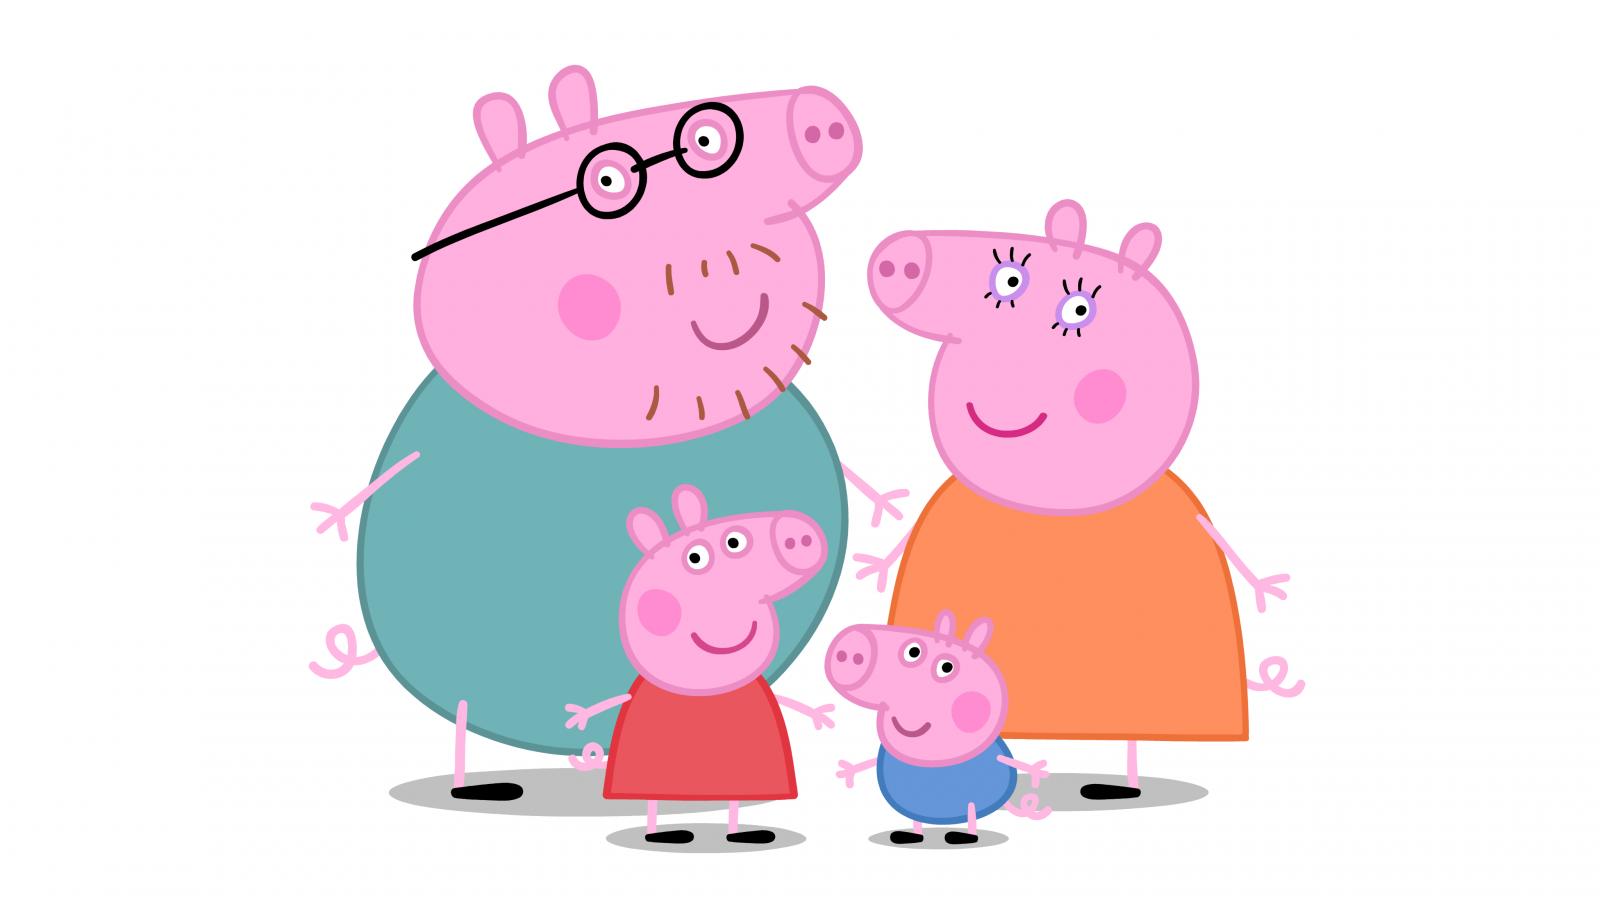 Vers la fin de Peppa Pig ? - Les Aventures de Petite Bête